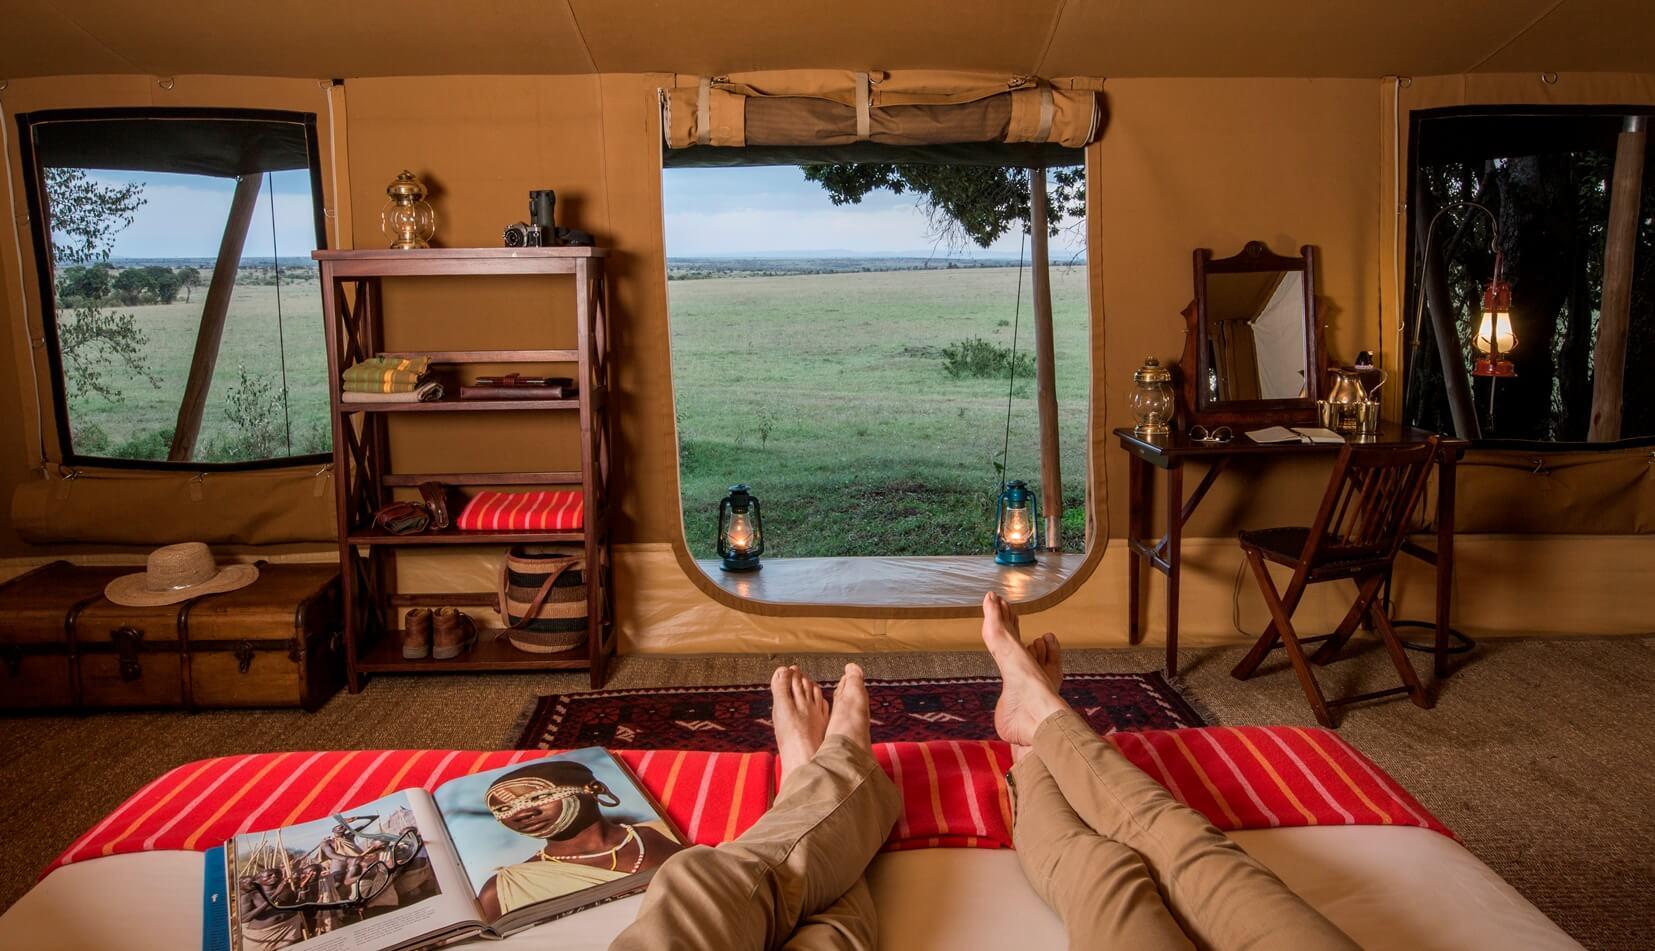 elephant_pepper_camp_-_accommodation_-_family__honeymoon__tent_csilverless-10